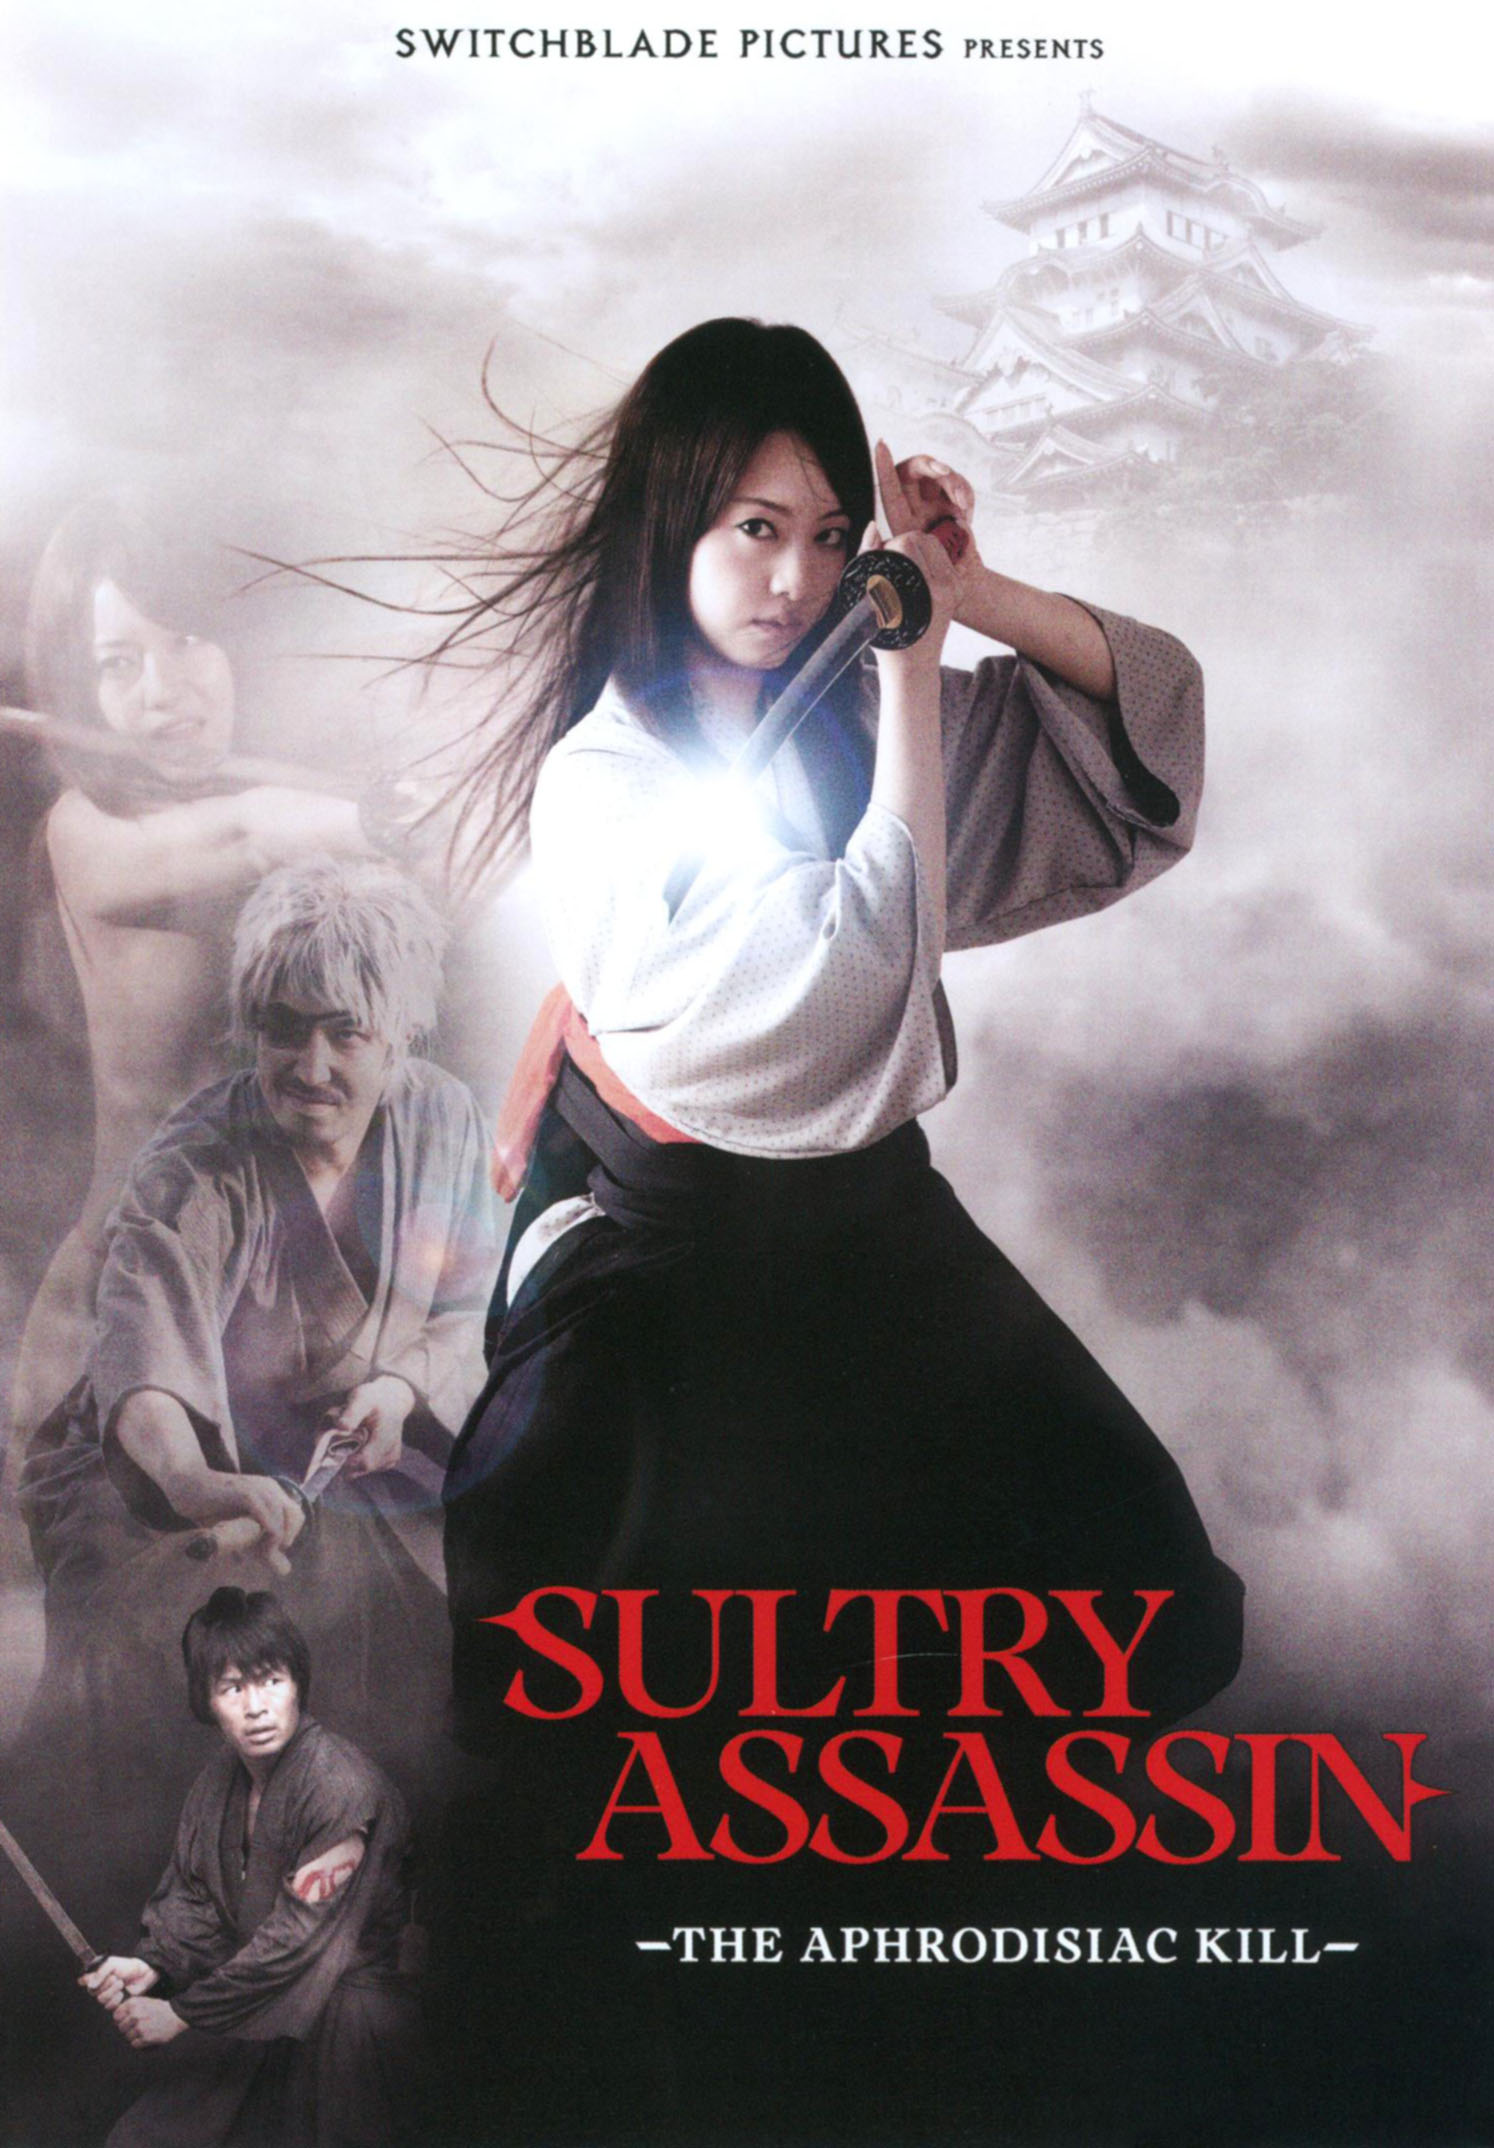 Sultry Assassin: The Aphrodisiac Kill